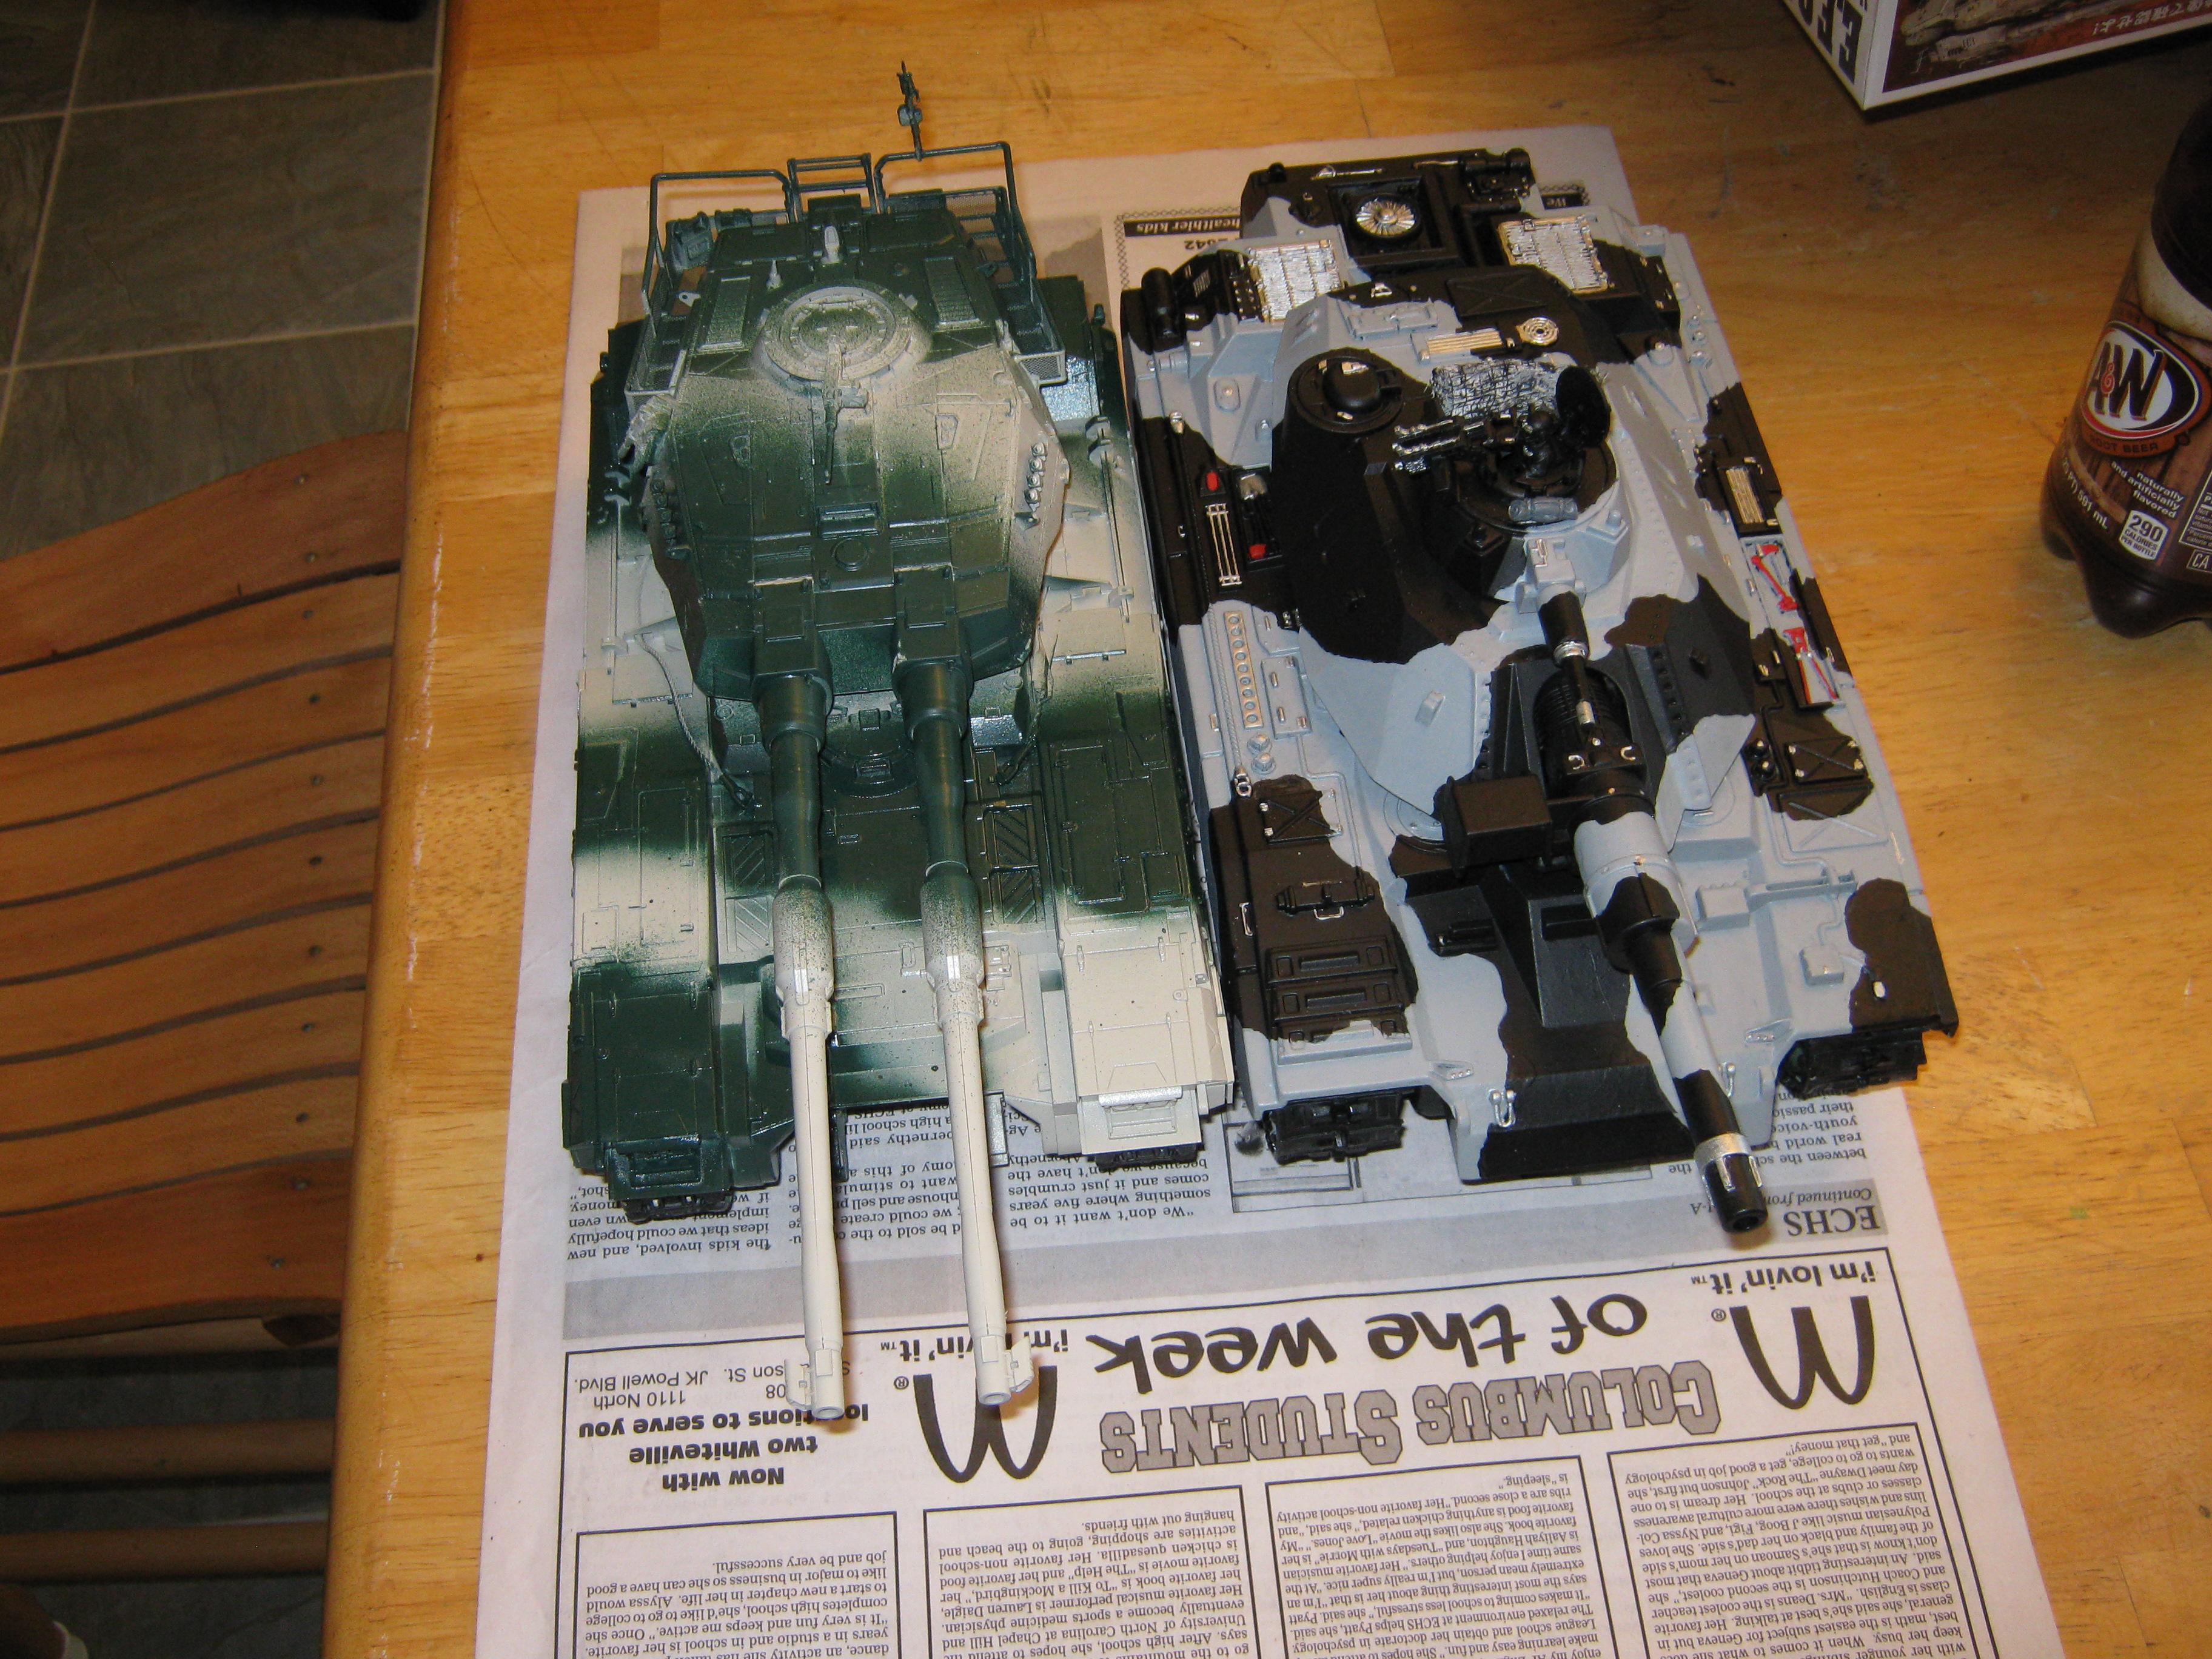 Gundam, M61a5, Super-heavy, Tank, Type 61